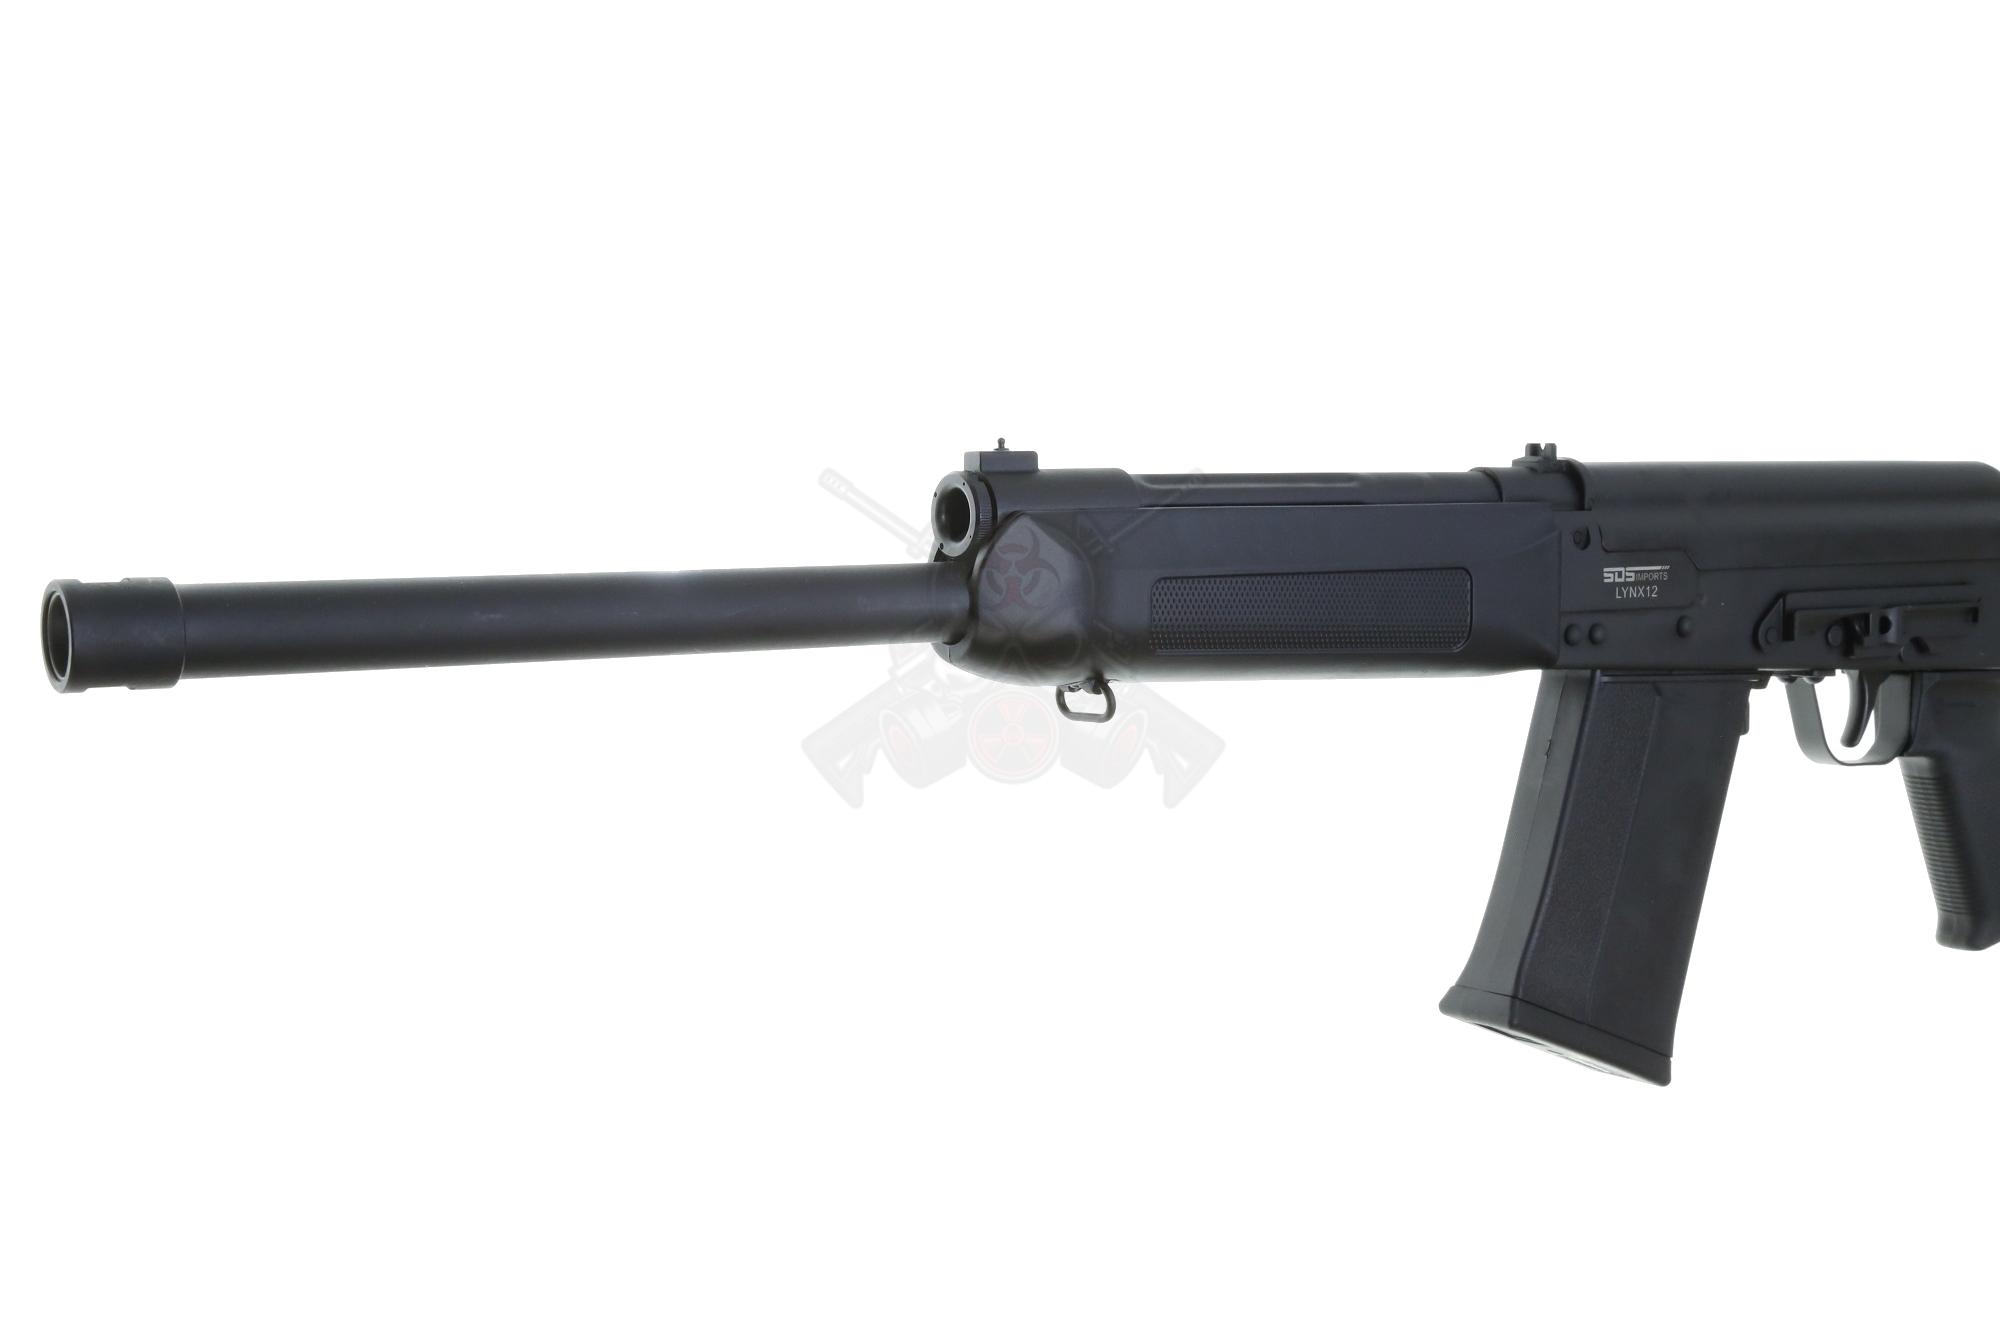 SDS Imports Lynx Shotgun with Magpul Grip and Magpul Zhukov Folding Stock  12ga 5rd 19